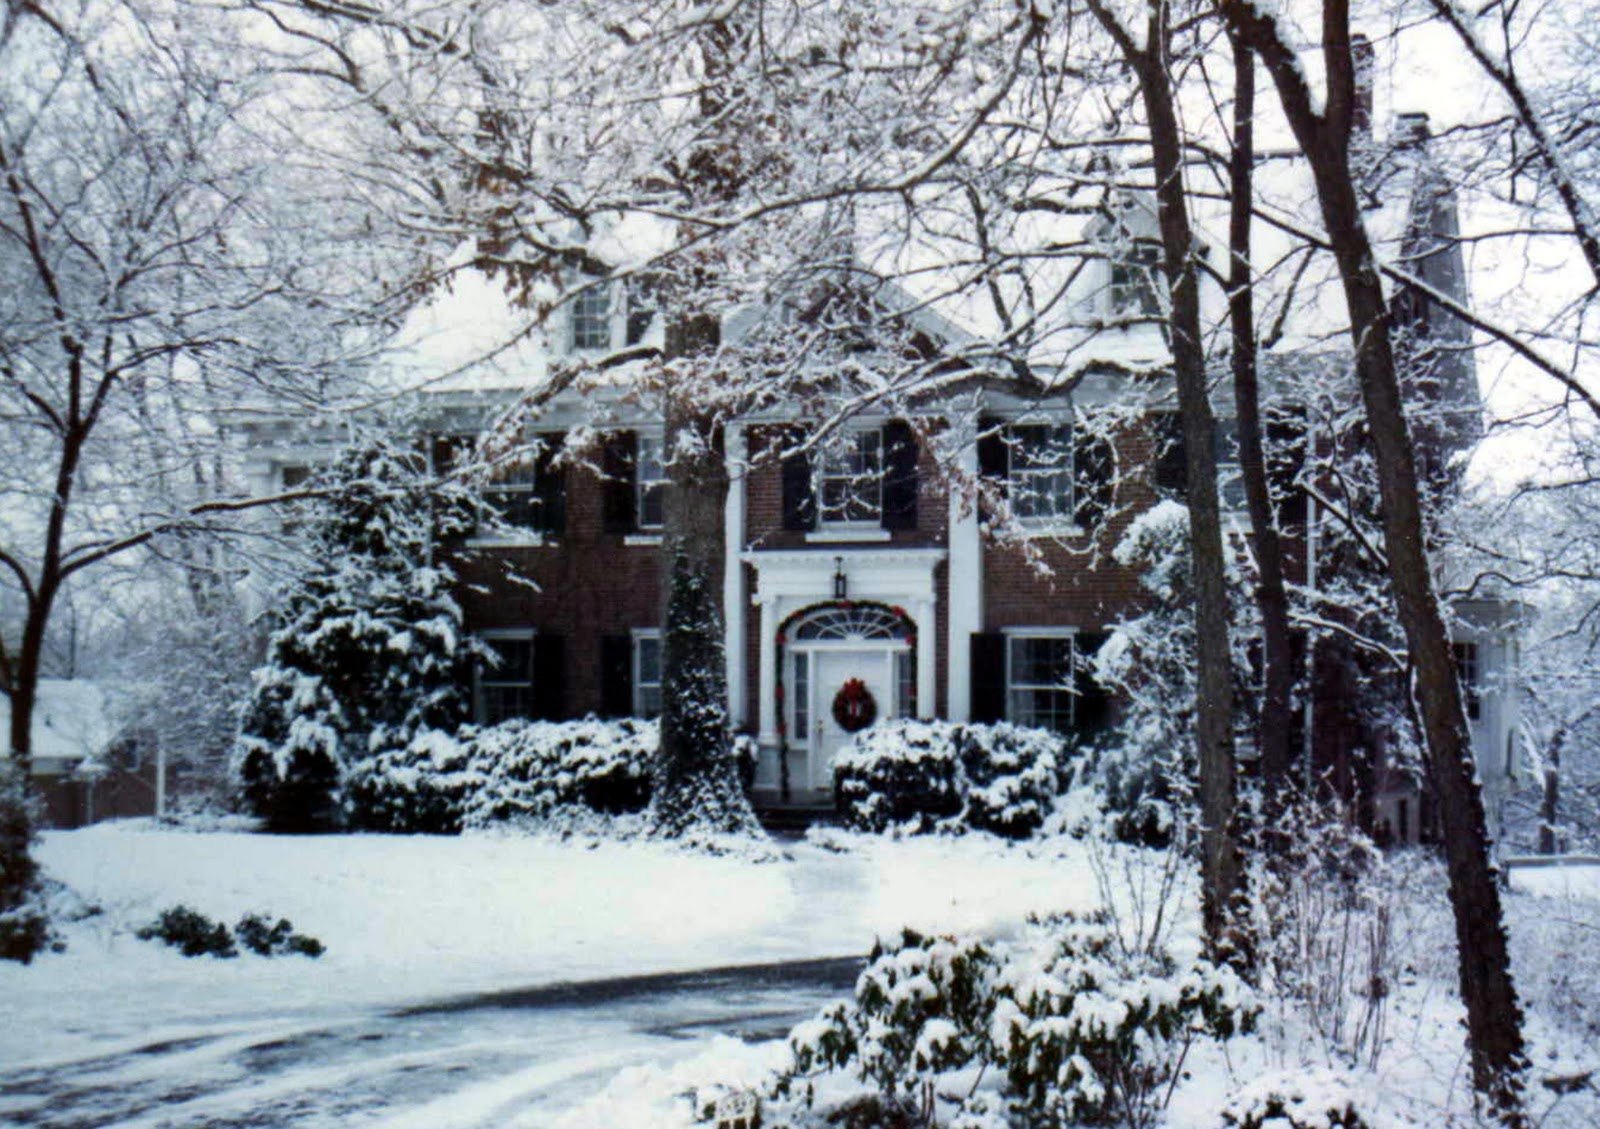 http://2.bp.blogspot.com/-YOWqsqUcFaA/TxG1MVpZWoI/AAAAAAAAJYI/Q0HEj9lYNaE/s1600/snow+tree_001.jpg